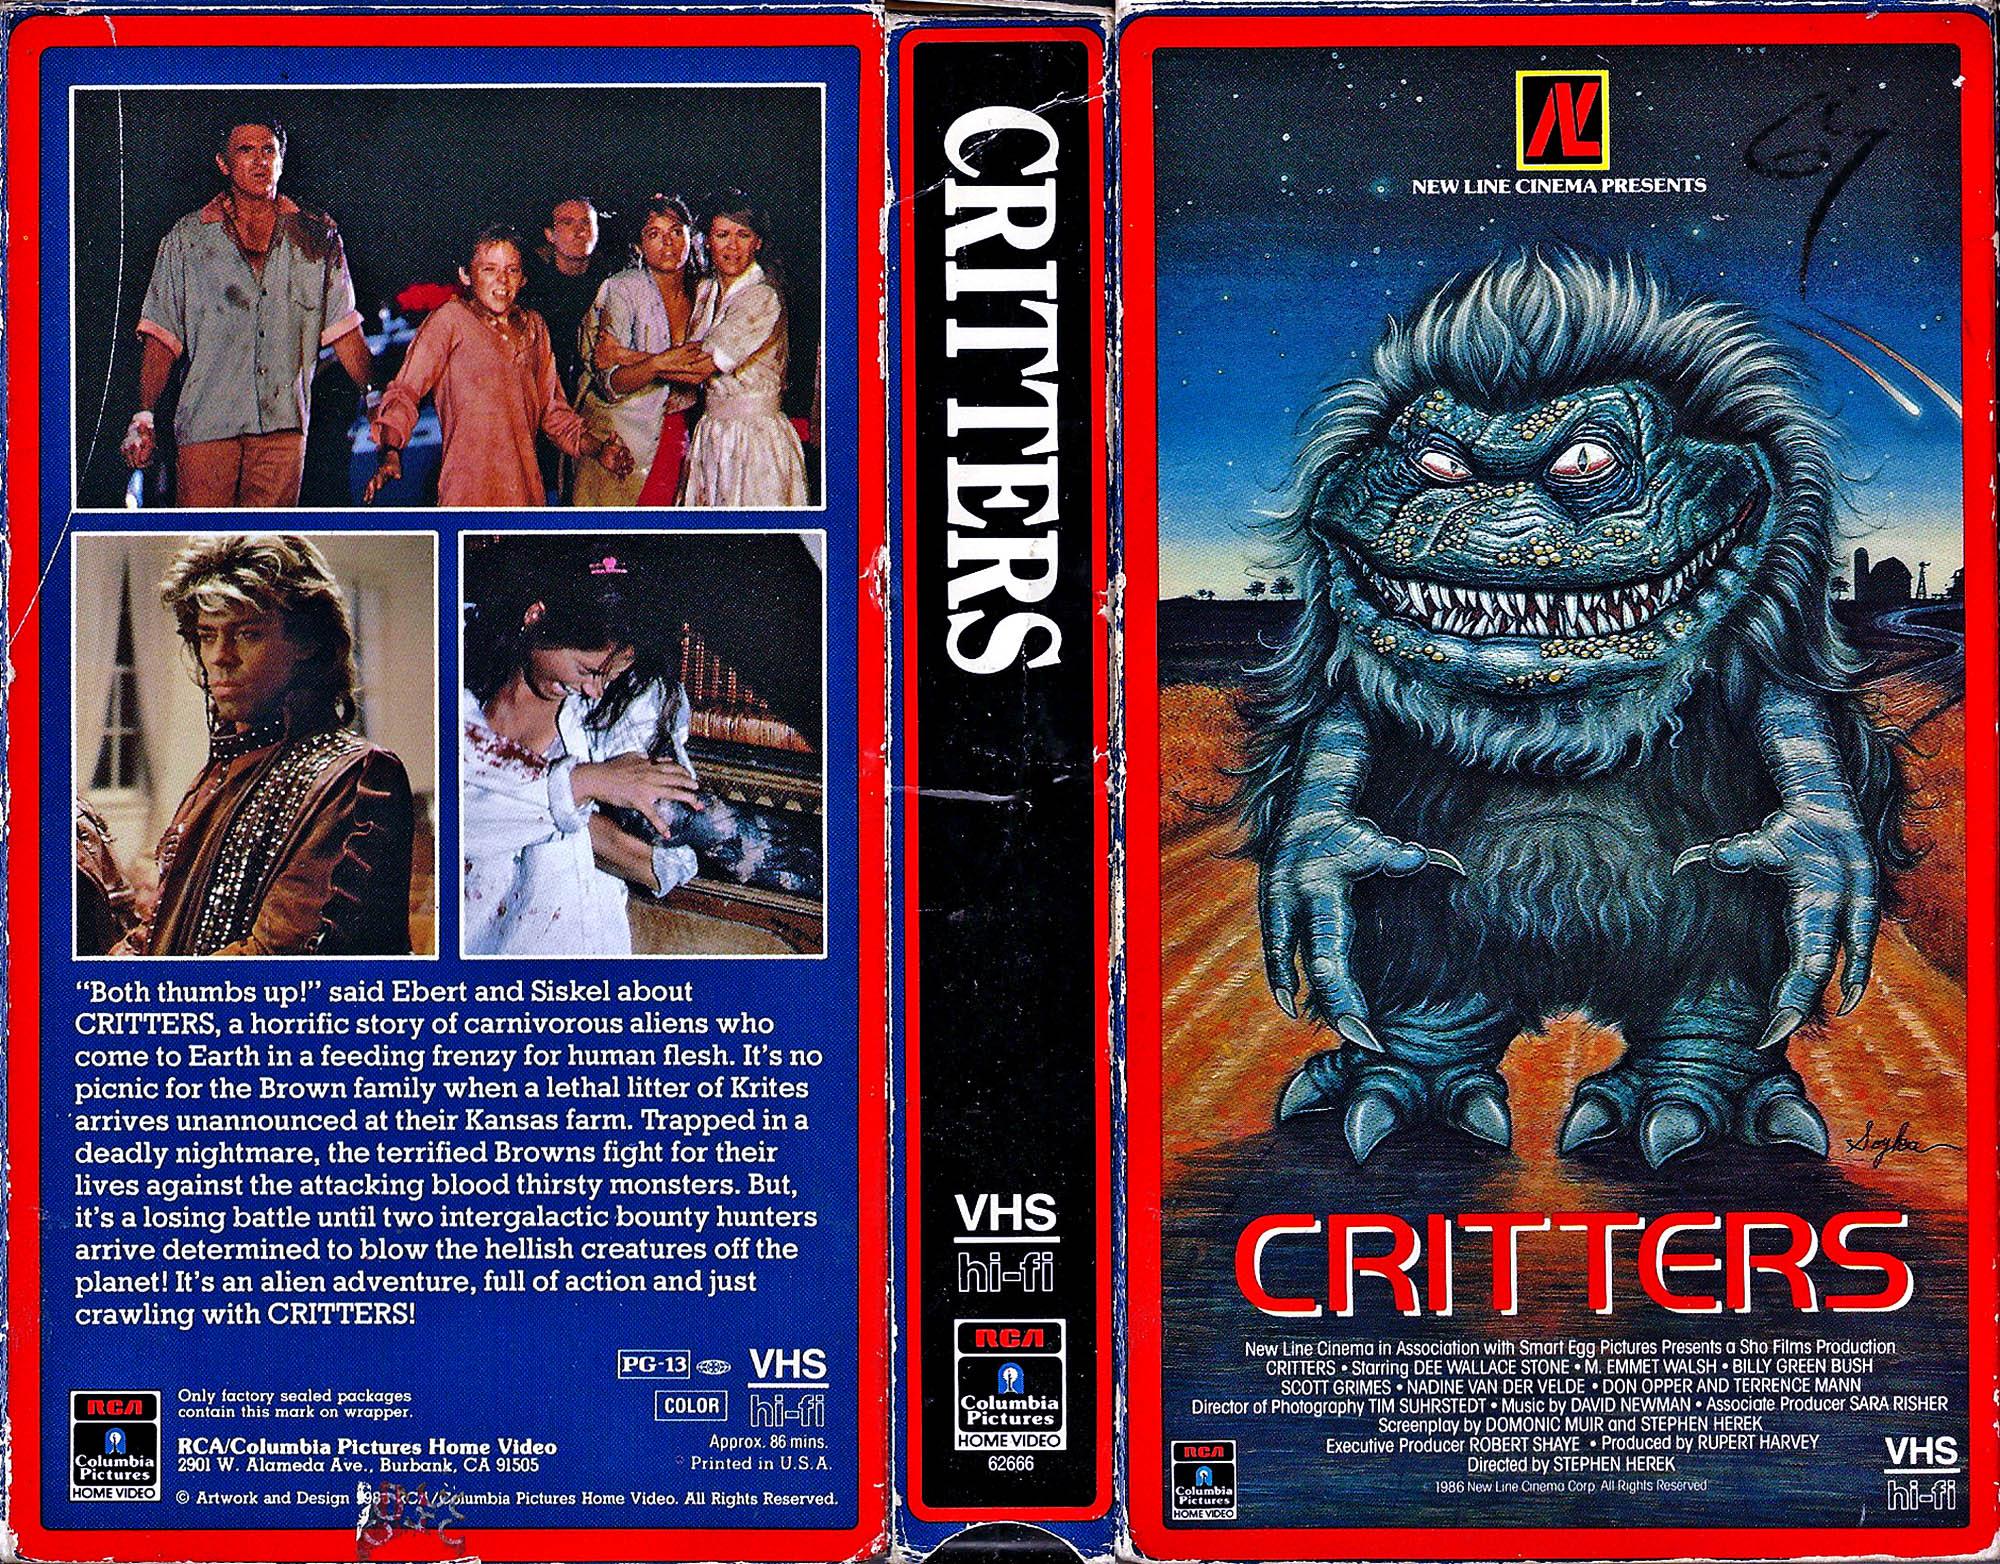 critters-1-vhs-cover-usa-dvdbash-wordpress.jpg